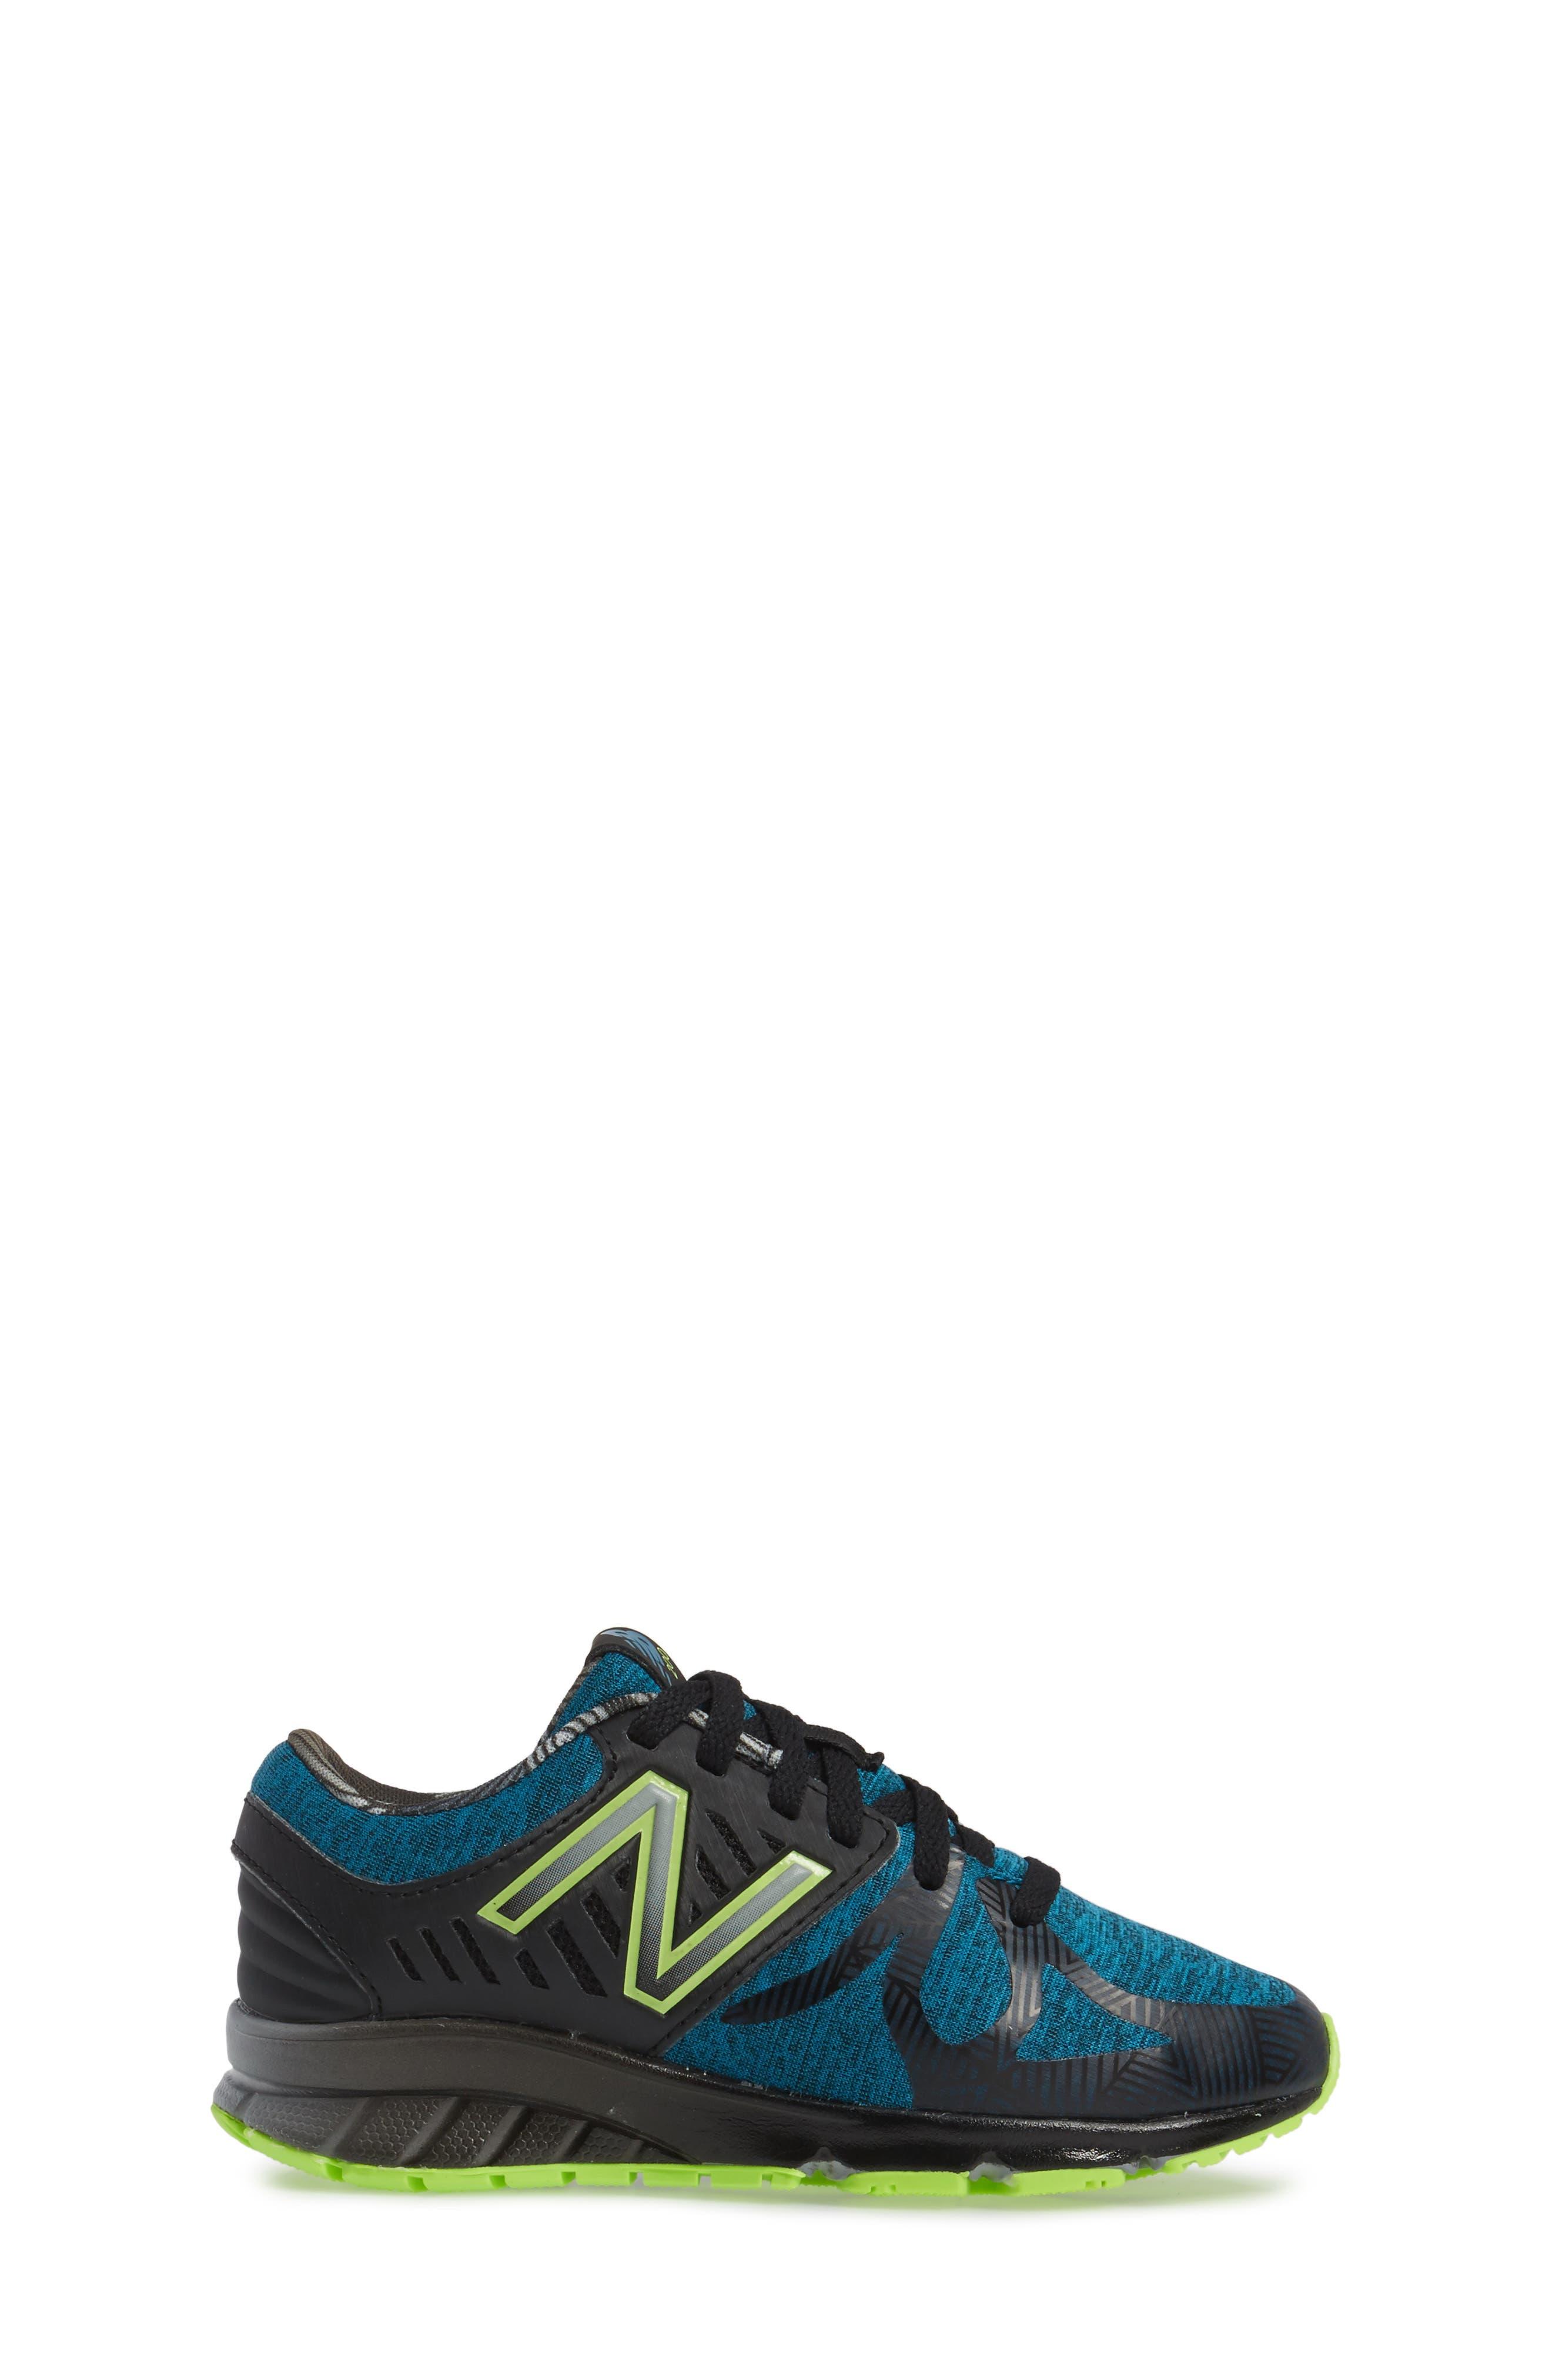 200 Electric Rainbow Athletic Shoe,                             Alternate thumbnail 3, color,                             407